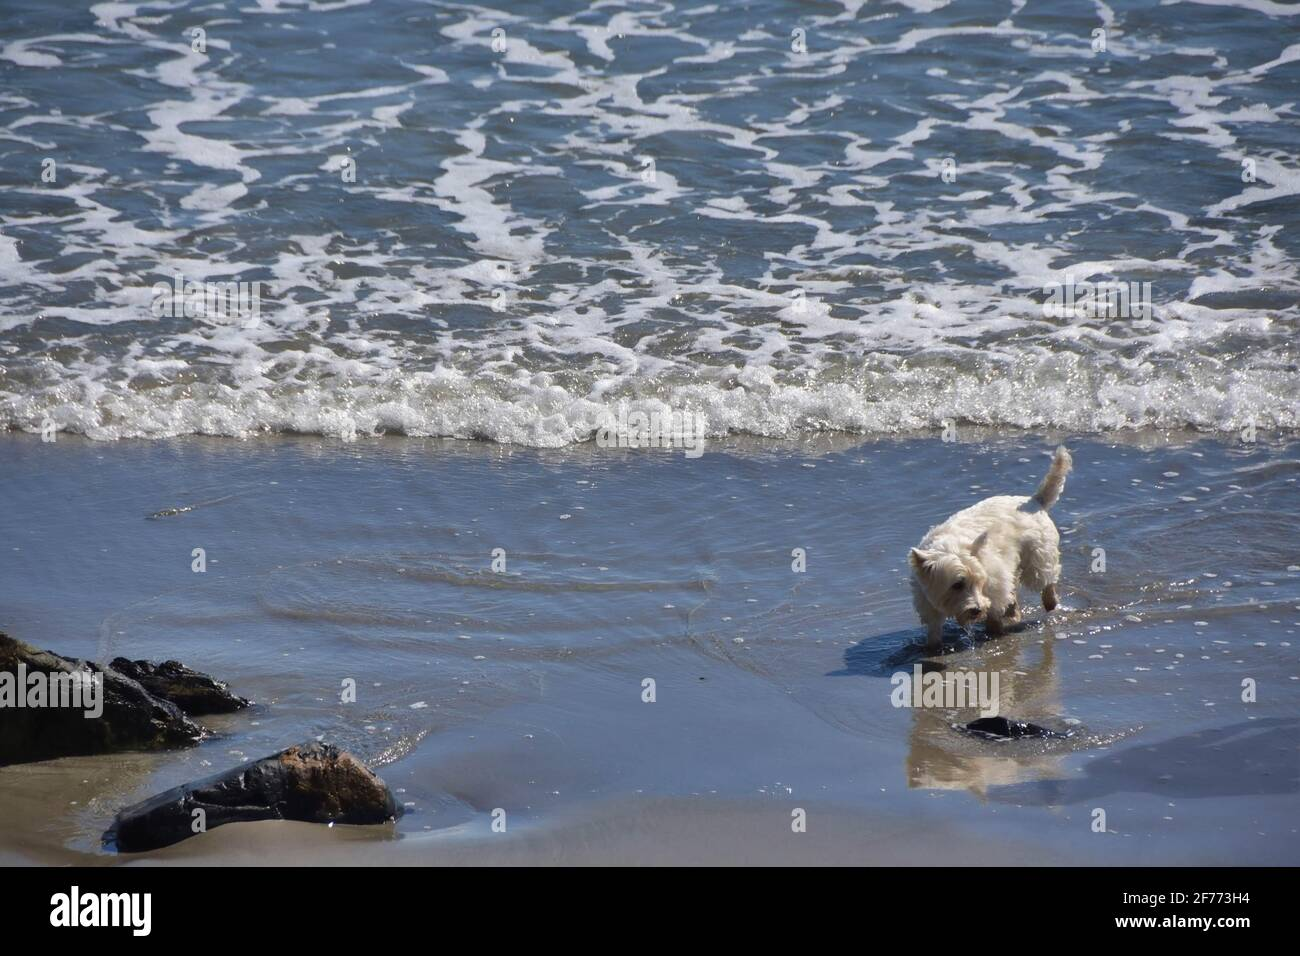 Little dog on the beach, Maine Stock Photo